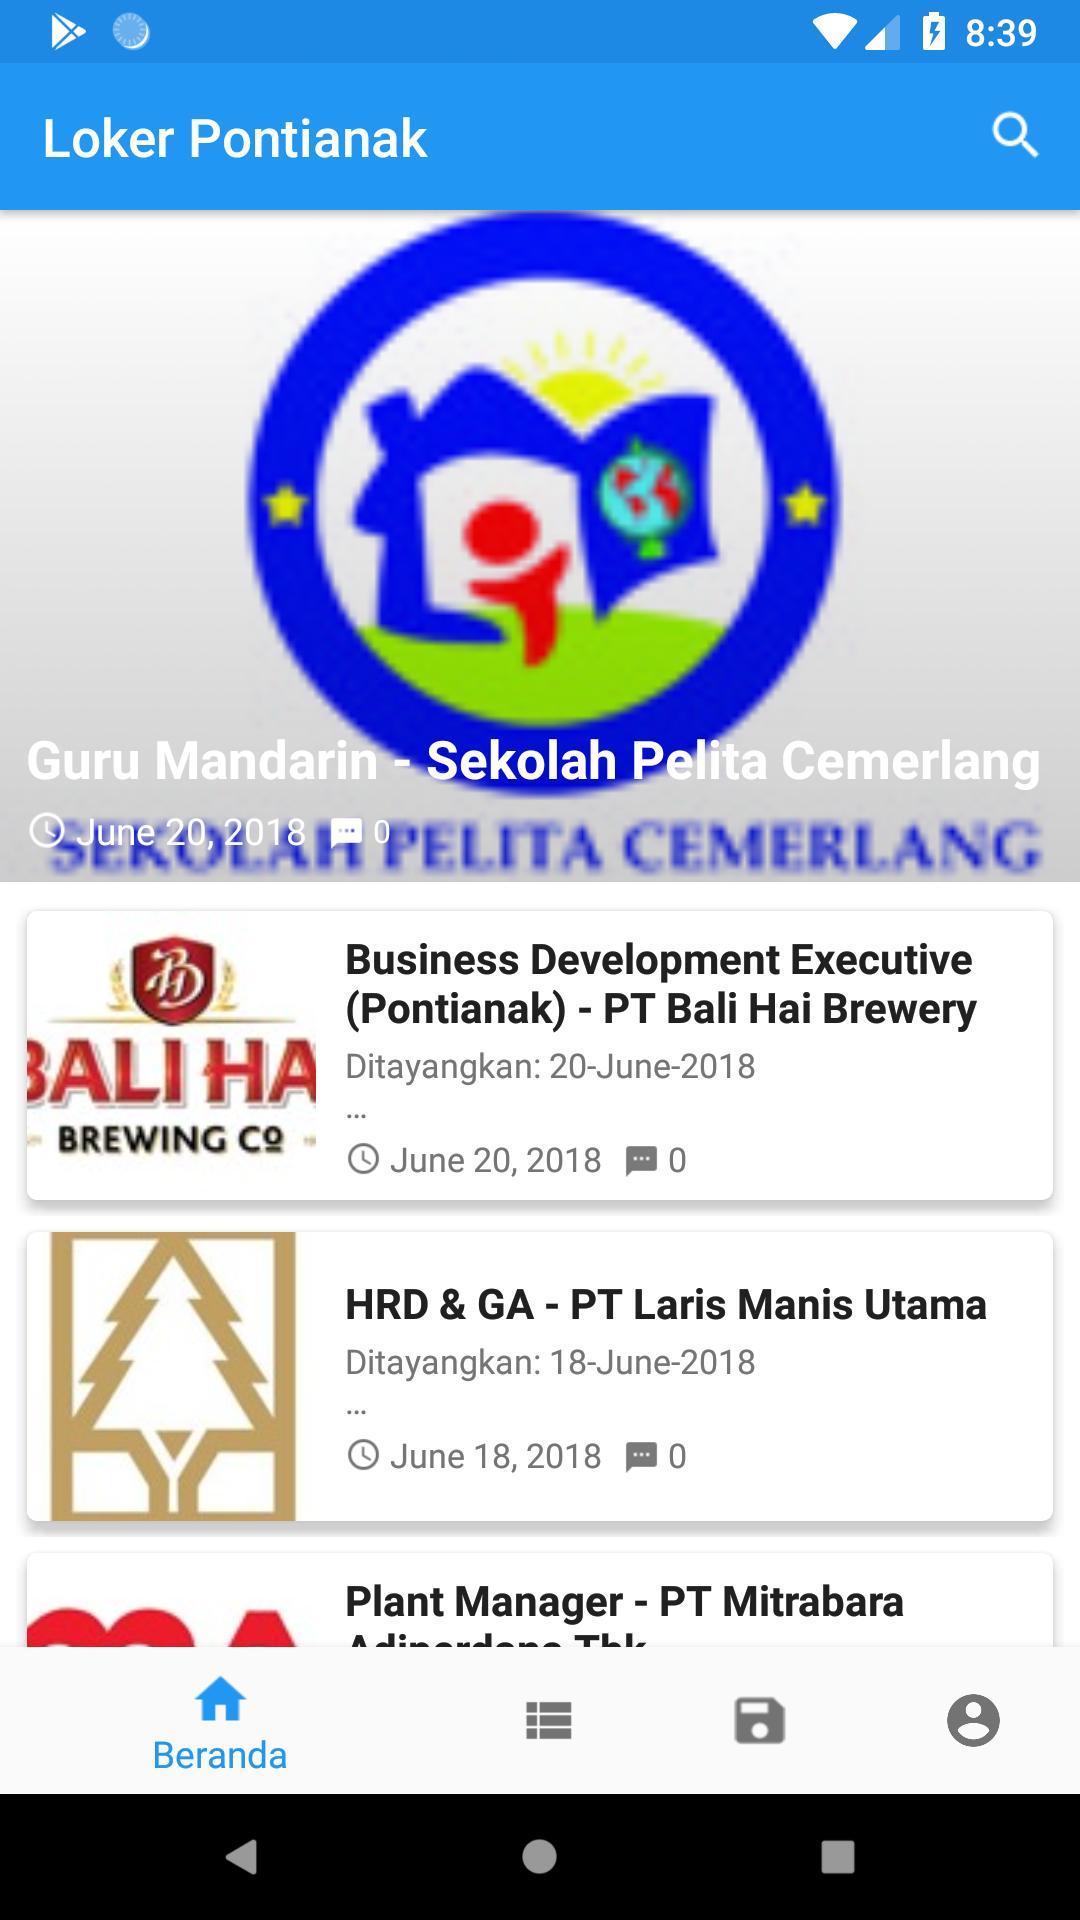 Lowongan Kerja Pt Bali Hai Brewery Indonesia Info Seputar Kerjaan